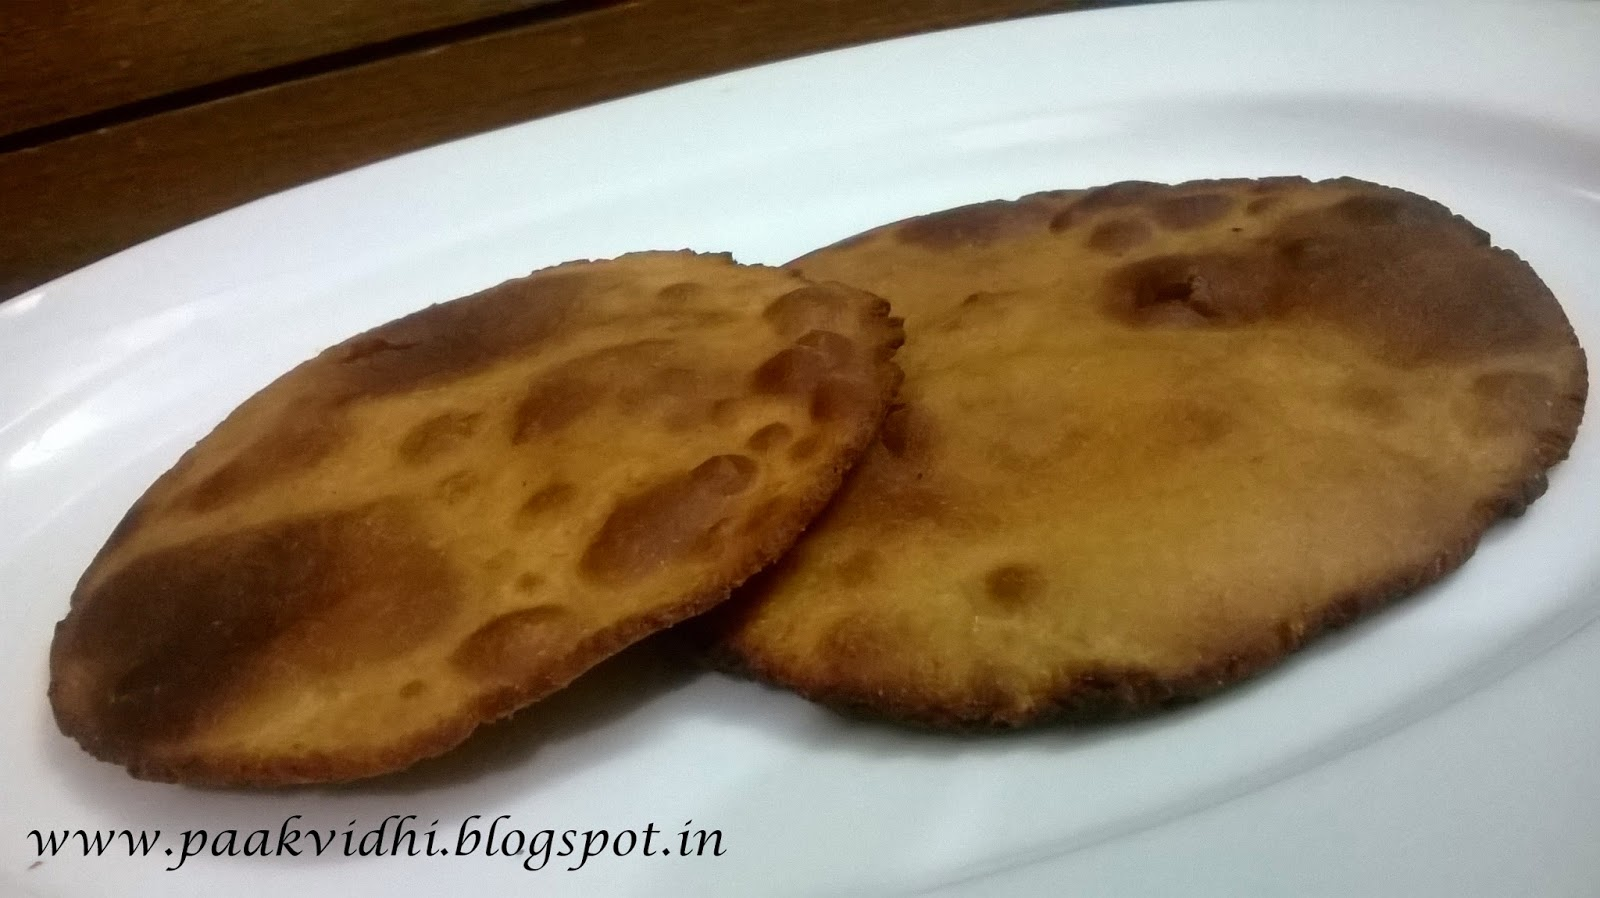 http://paakvidhi.blogspot.in/2014/03/basadia-meethi-gur-ki-poorigur-ki-roti.html